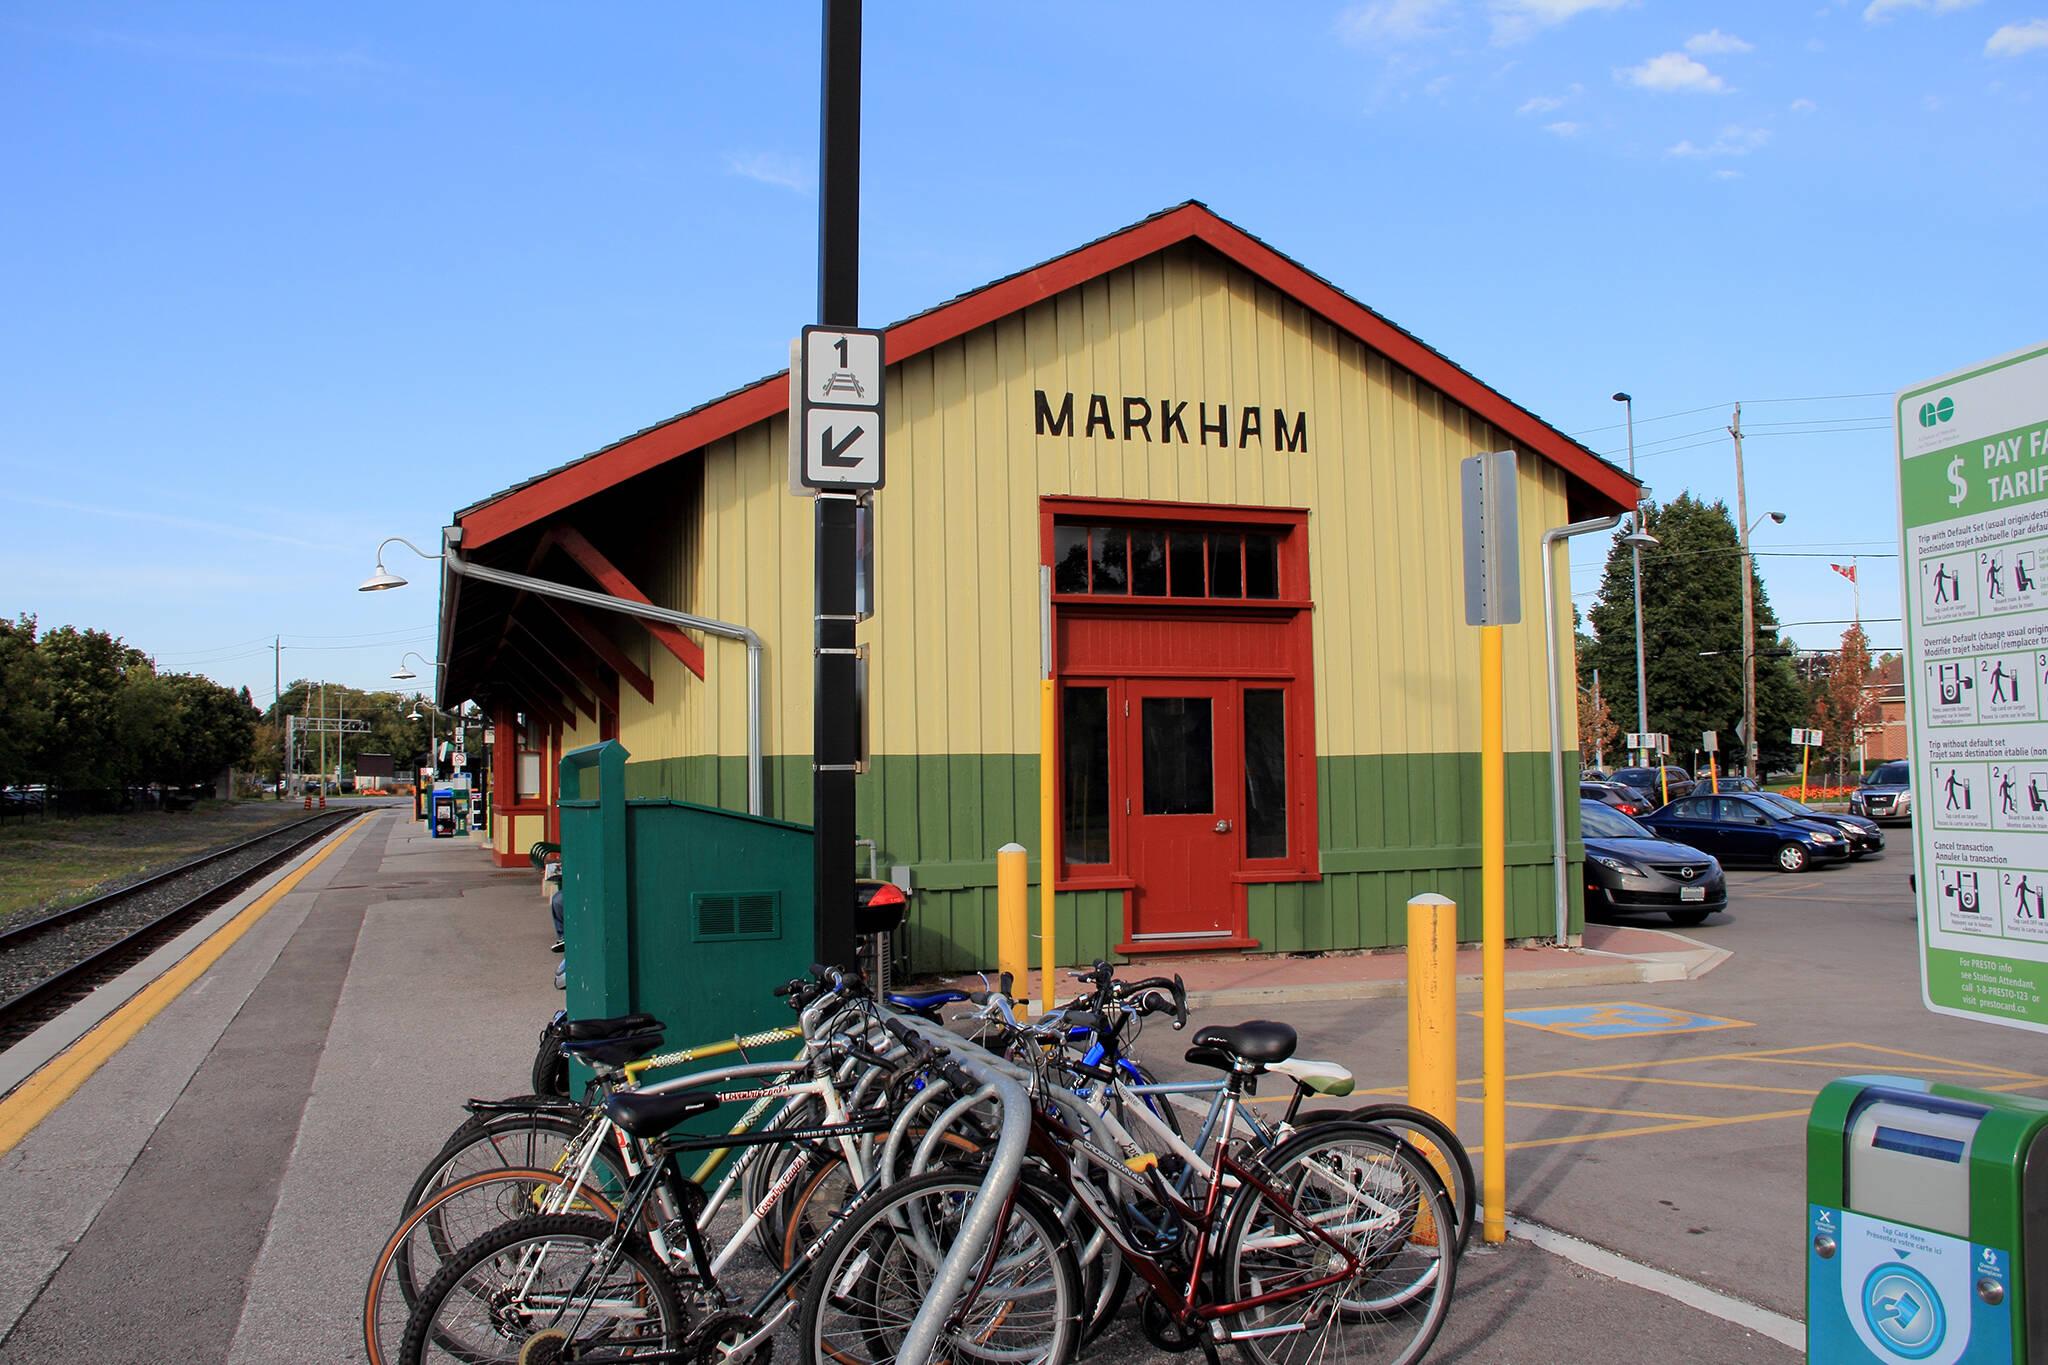 markham go station